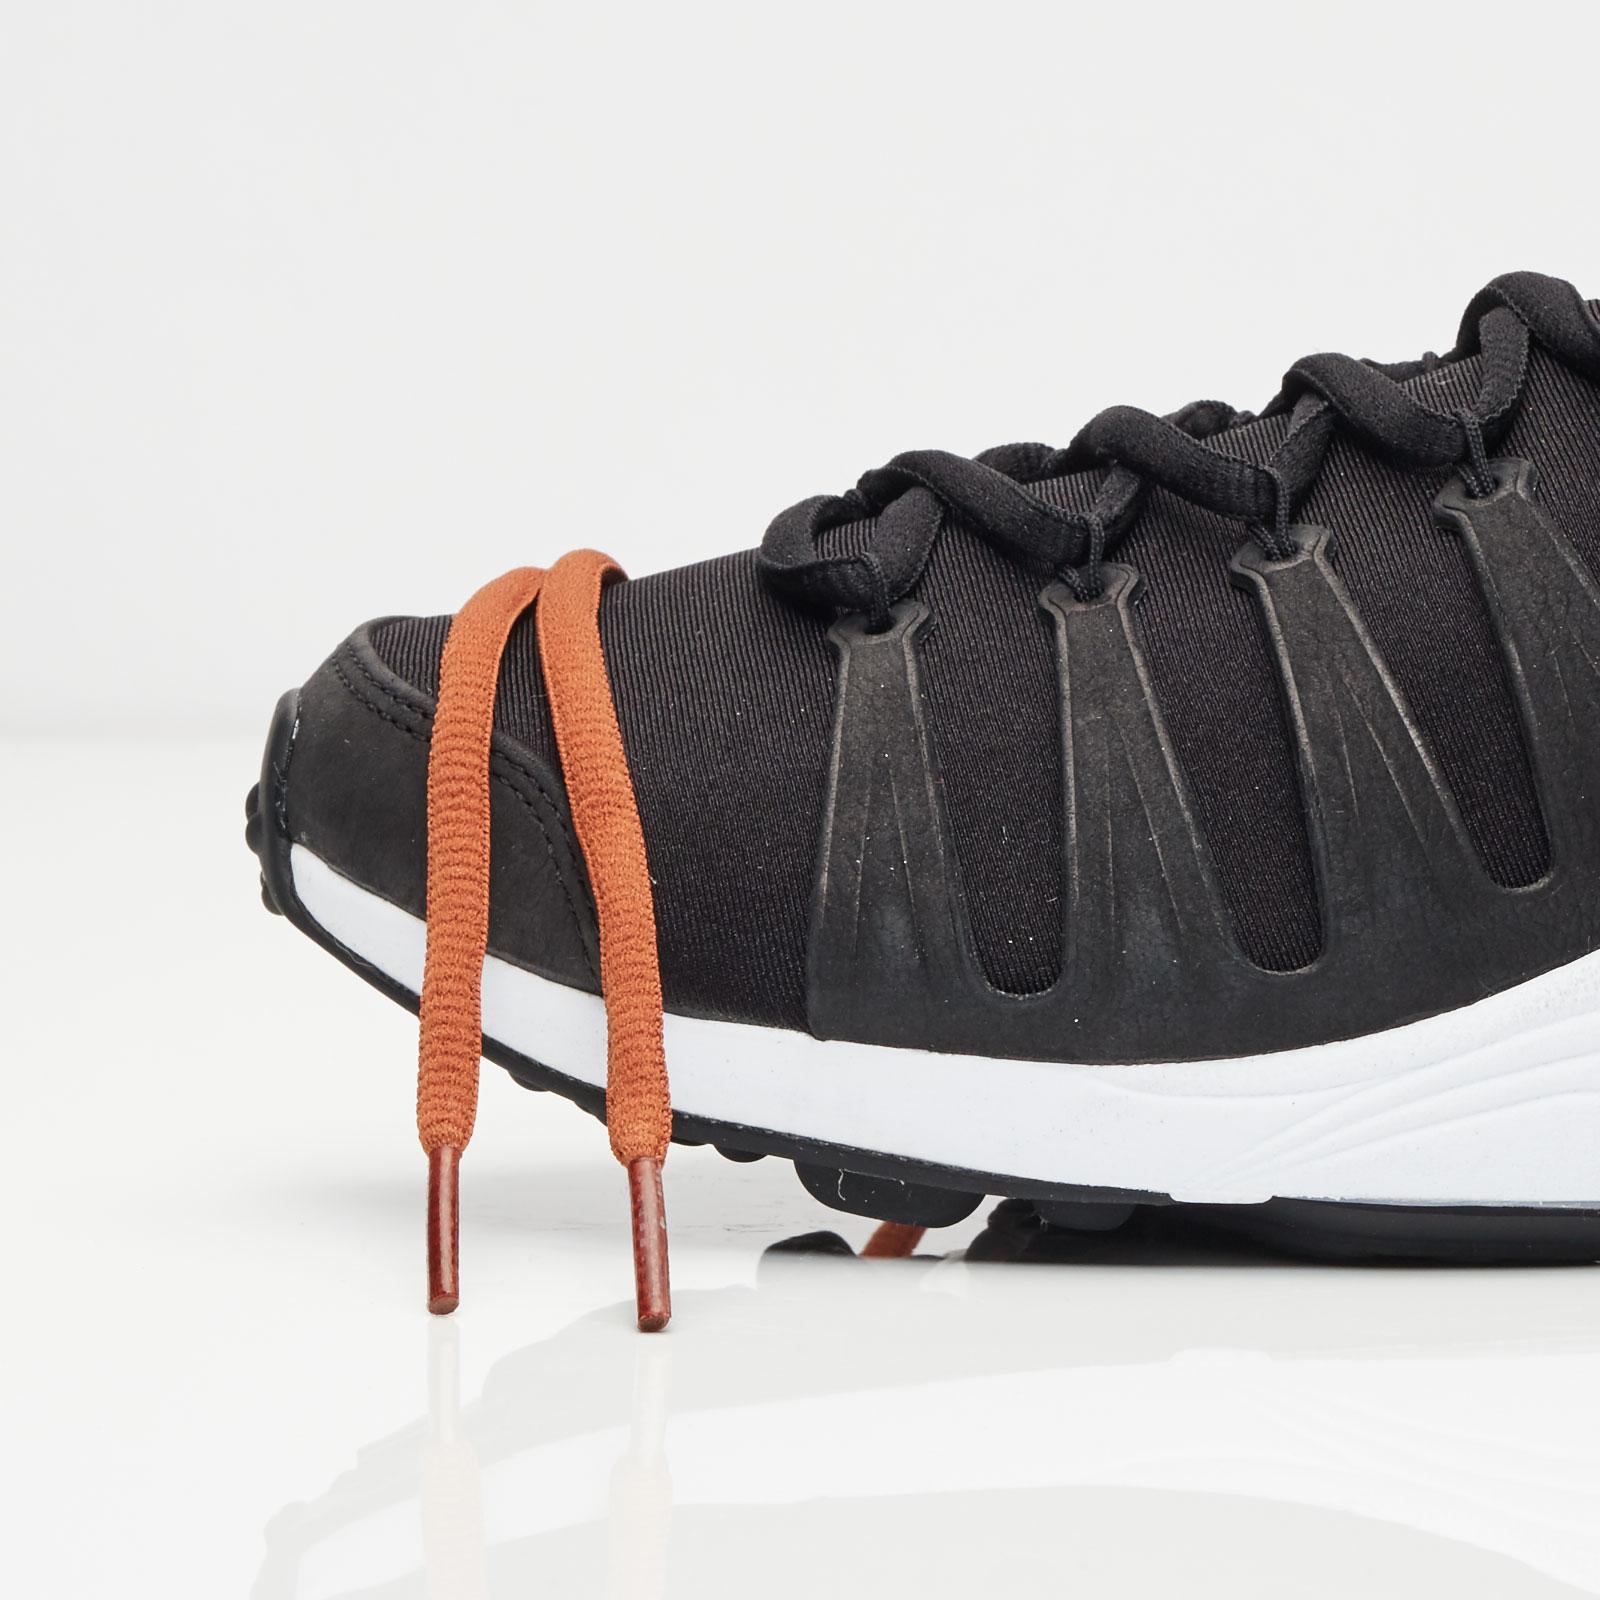 71005aafa7aeb Nike Air Zoom Spirimic - 881983-003 - Sneakersnstuff